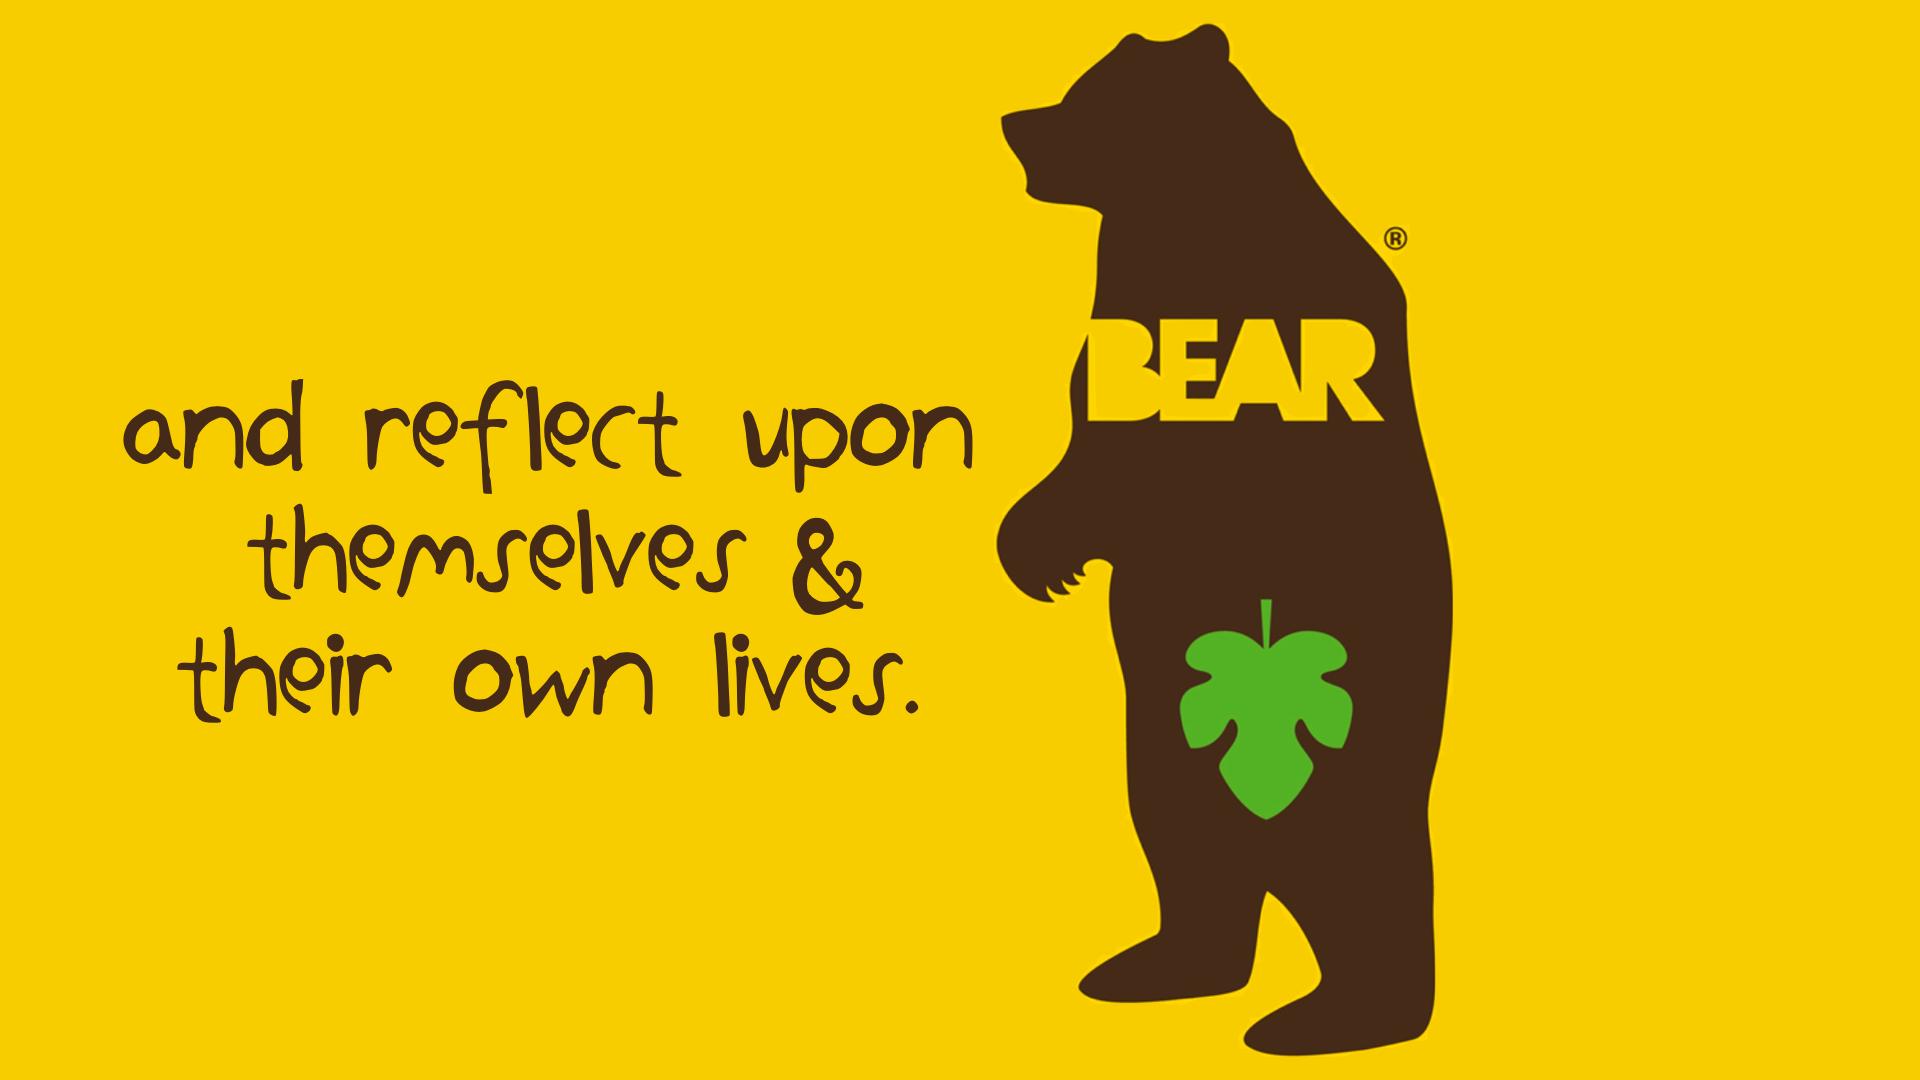 Bear Ideas 19th October 2016.016 Natalie Palmer Sutton | hand illustrated ideas for Bear Nibbles 42.jpeg